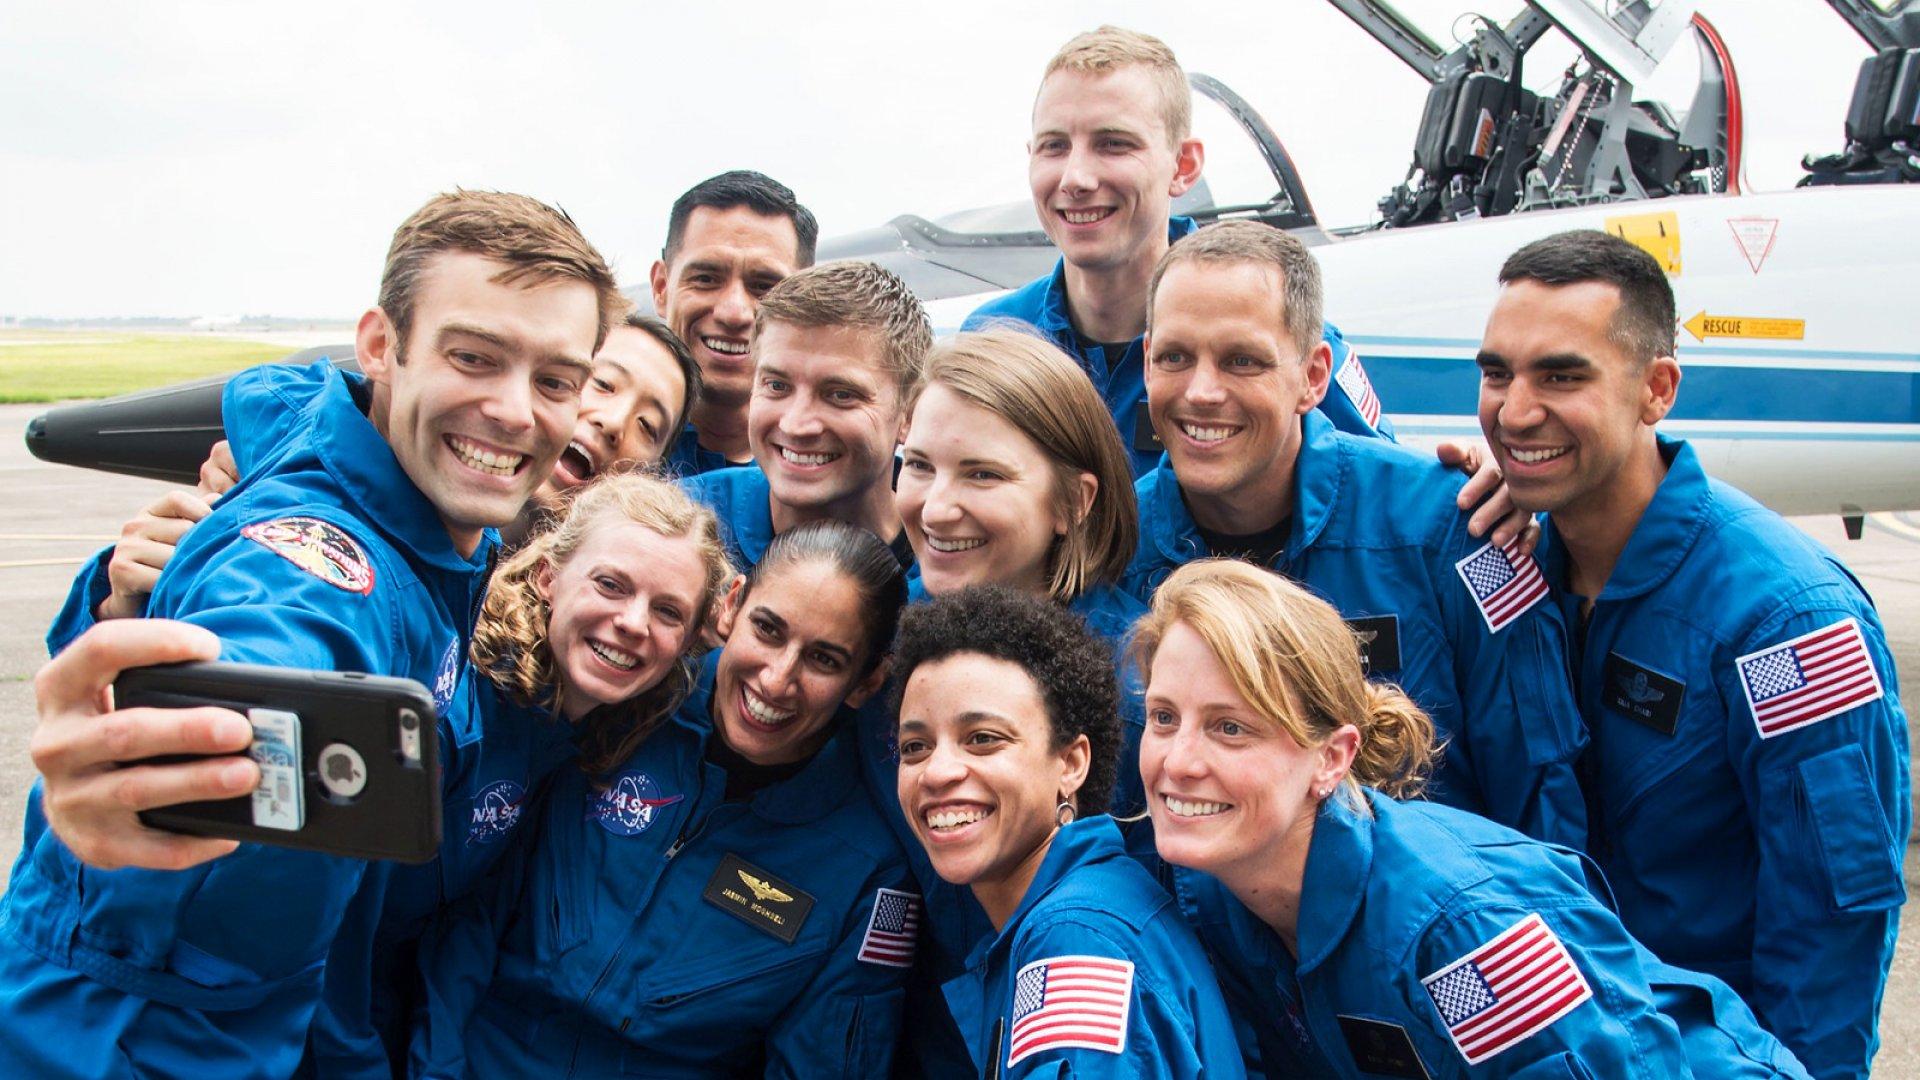 NASA's 2017 astronaut candidate class.